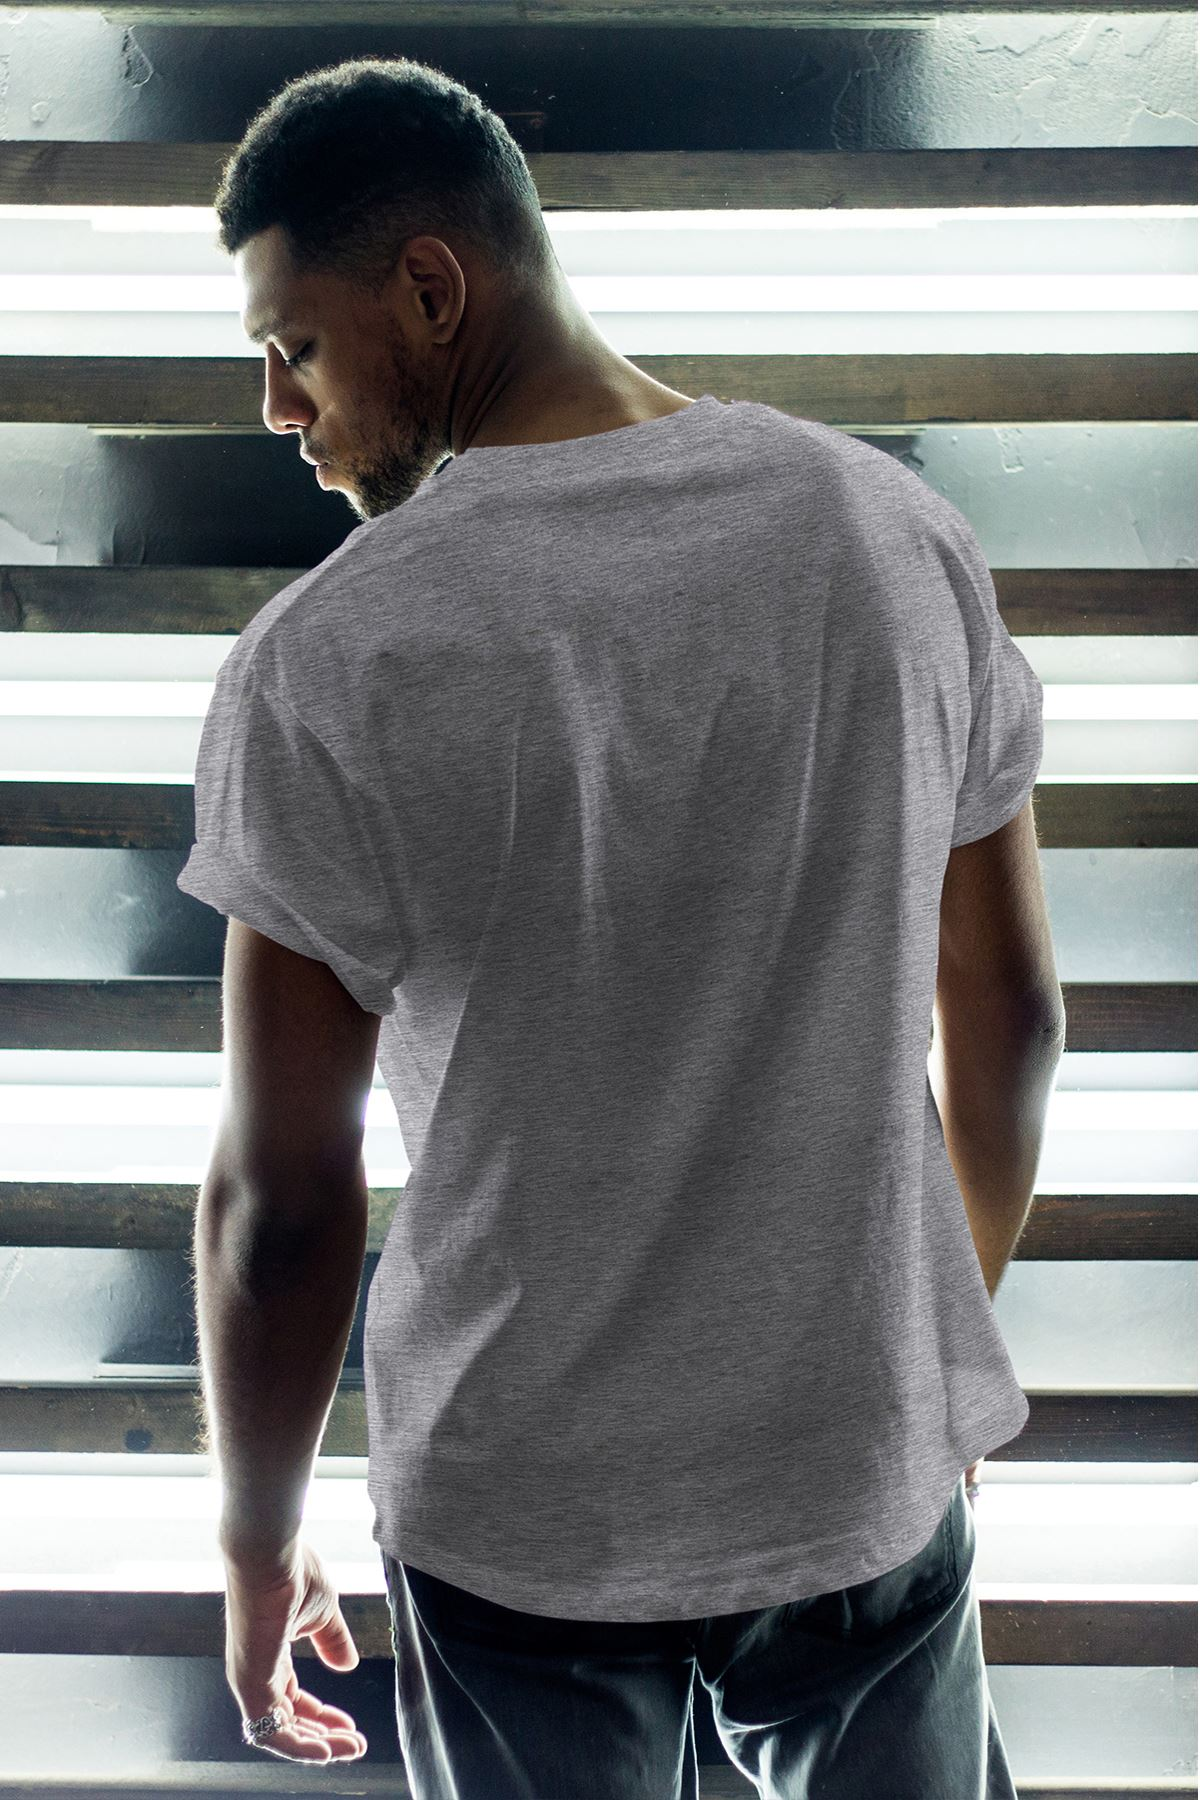 Anime Death Note 08 Gri Erkek Oversize Tshirt - Tişört